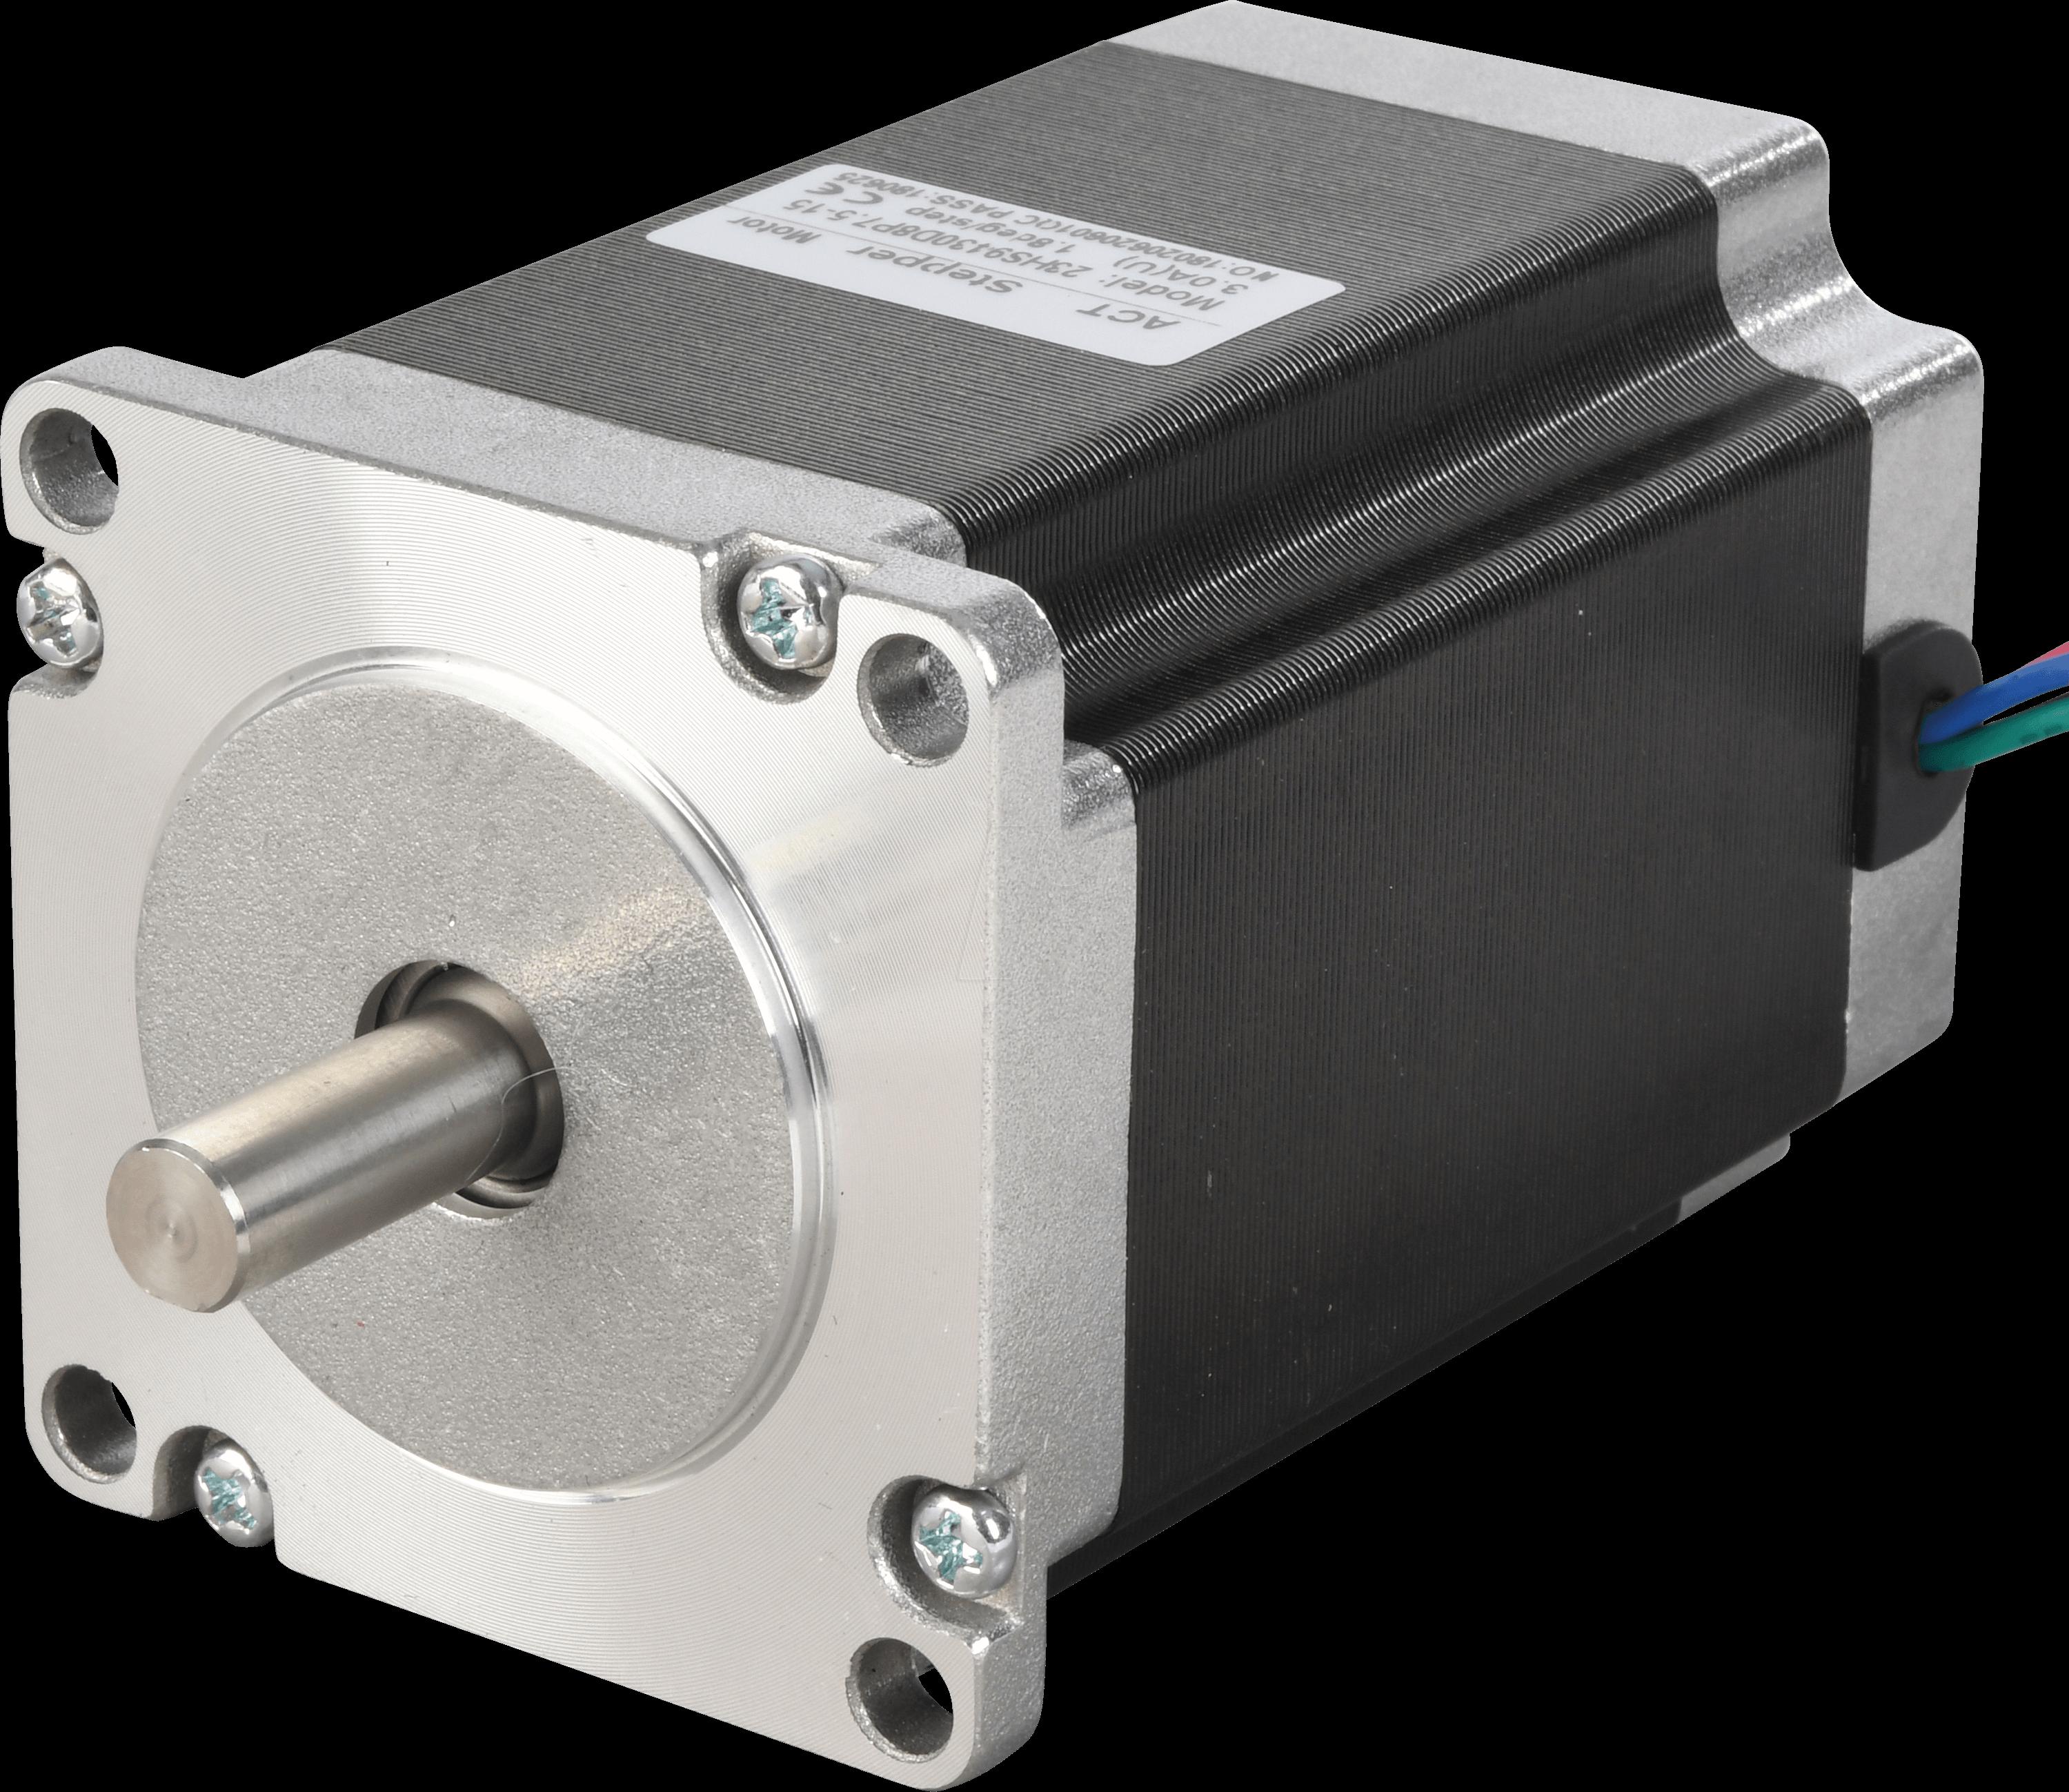 ACT 23HS9430D8P7 - Schrittmotor, 4 pol, 1,8 °, 3,6 V DC